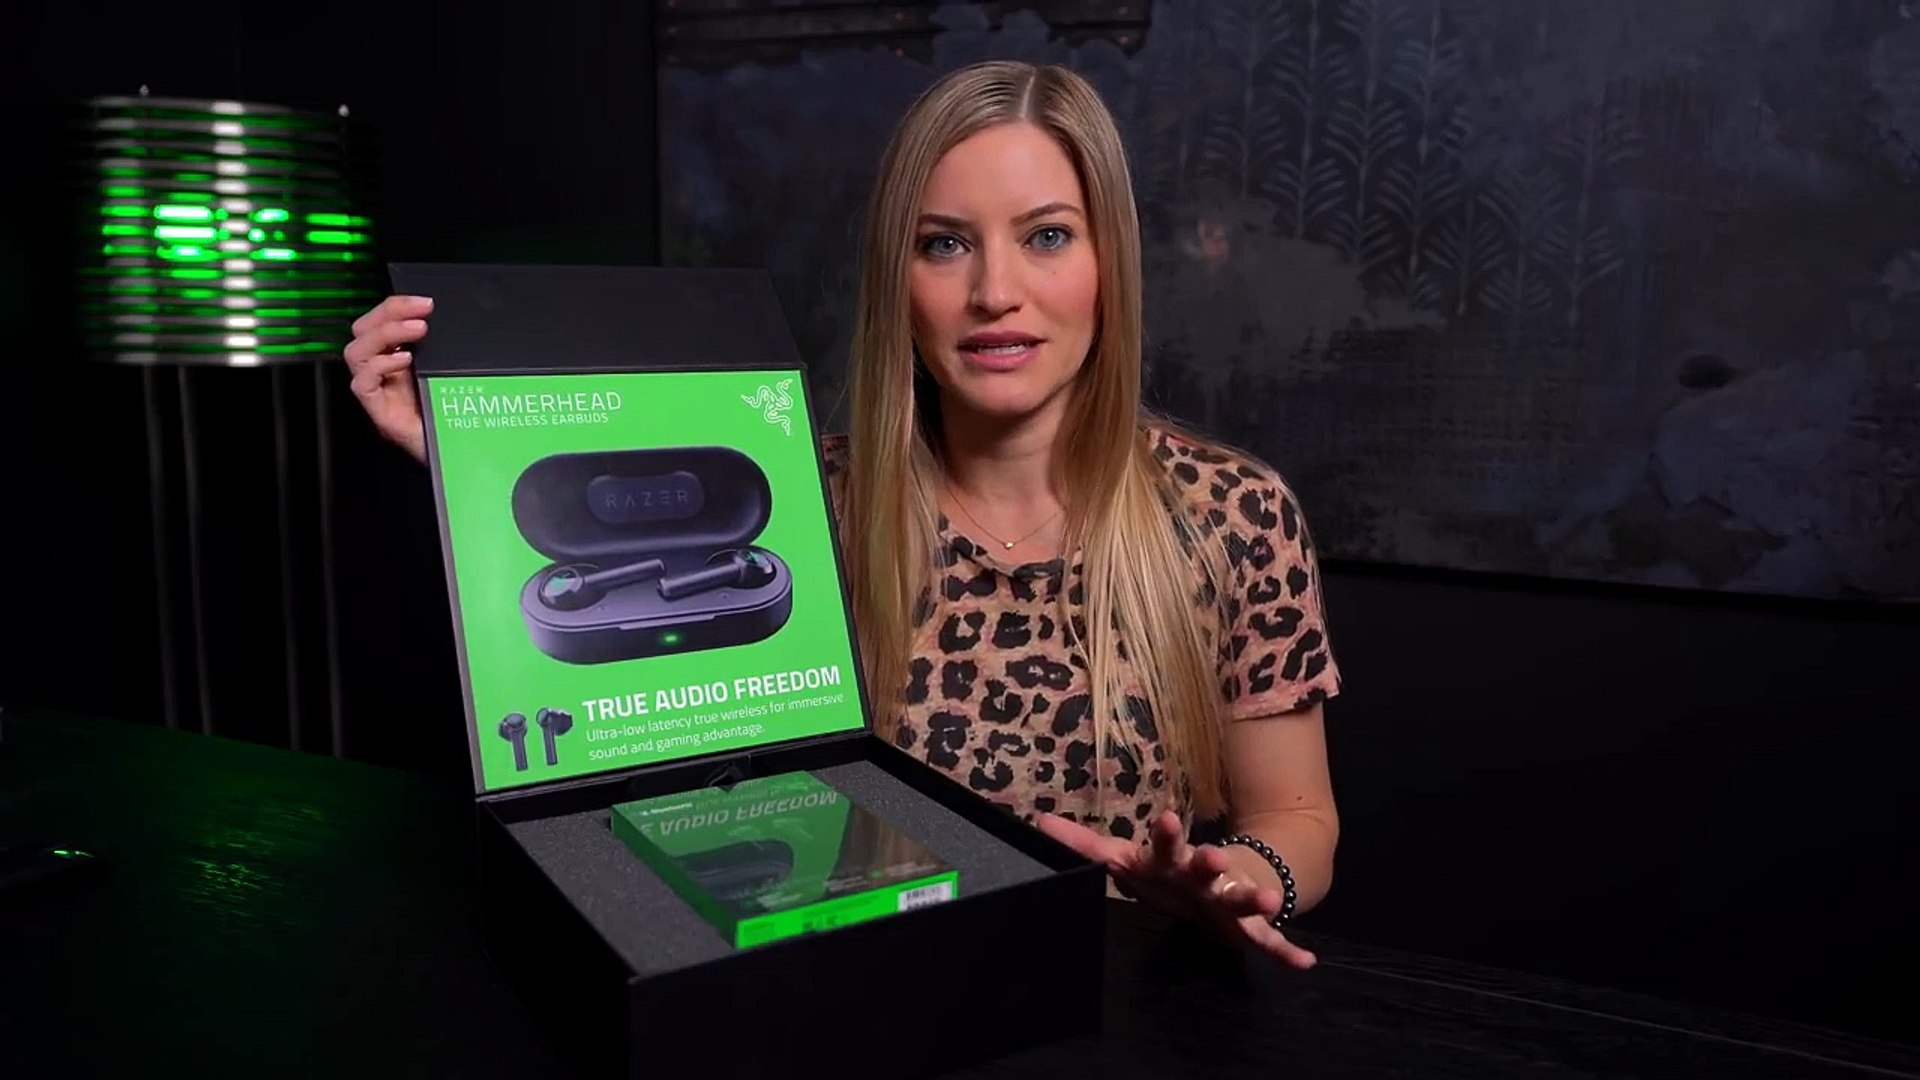 Razer S Airpods Hammerhead True Wireless Earbuds Video Dailymotion